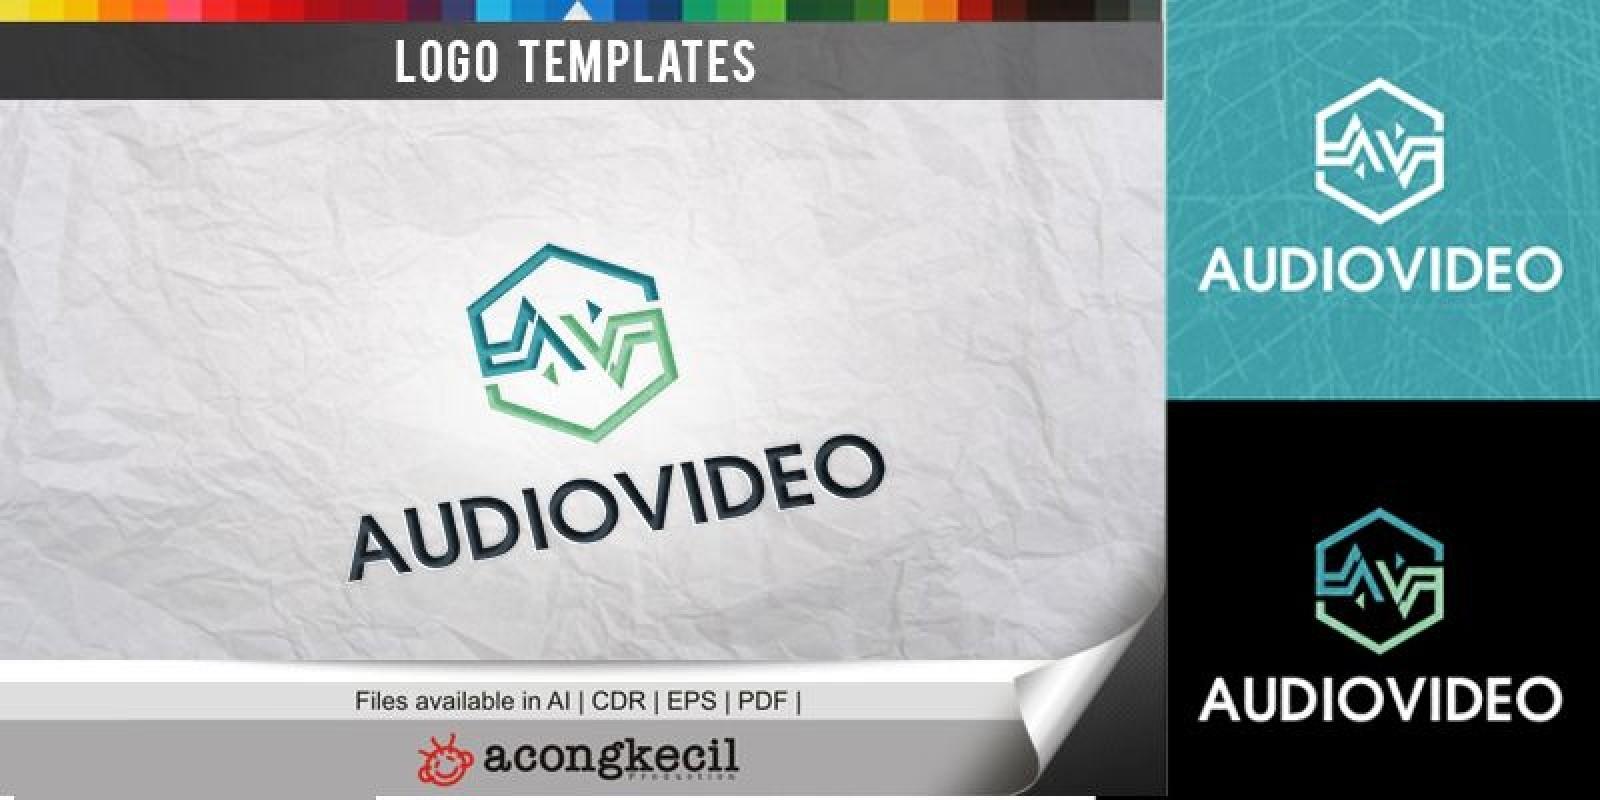 Audio Video V3 - Logo Template